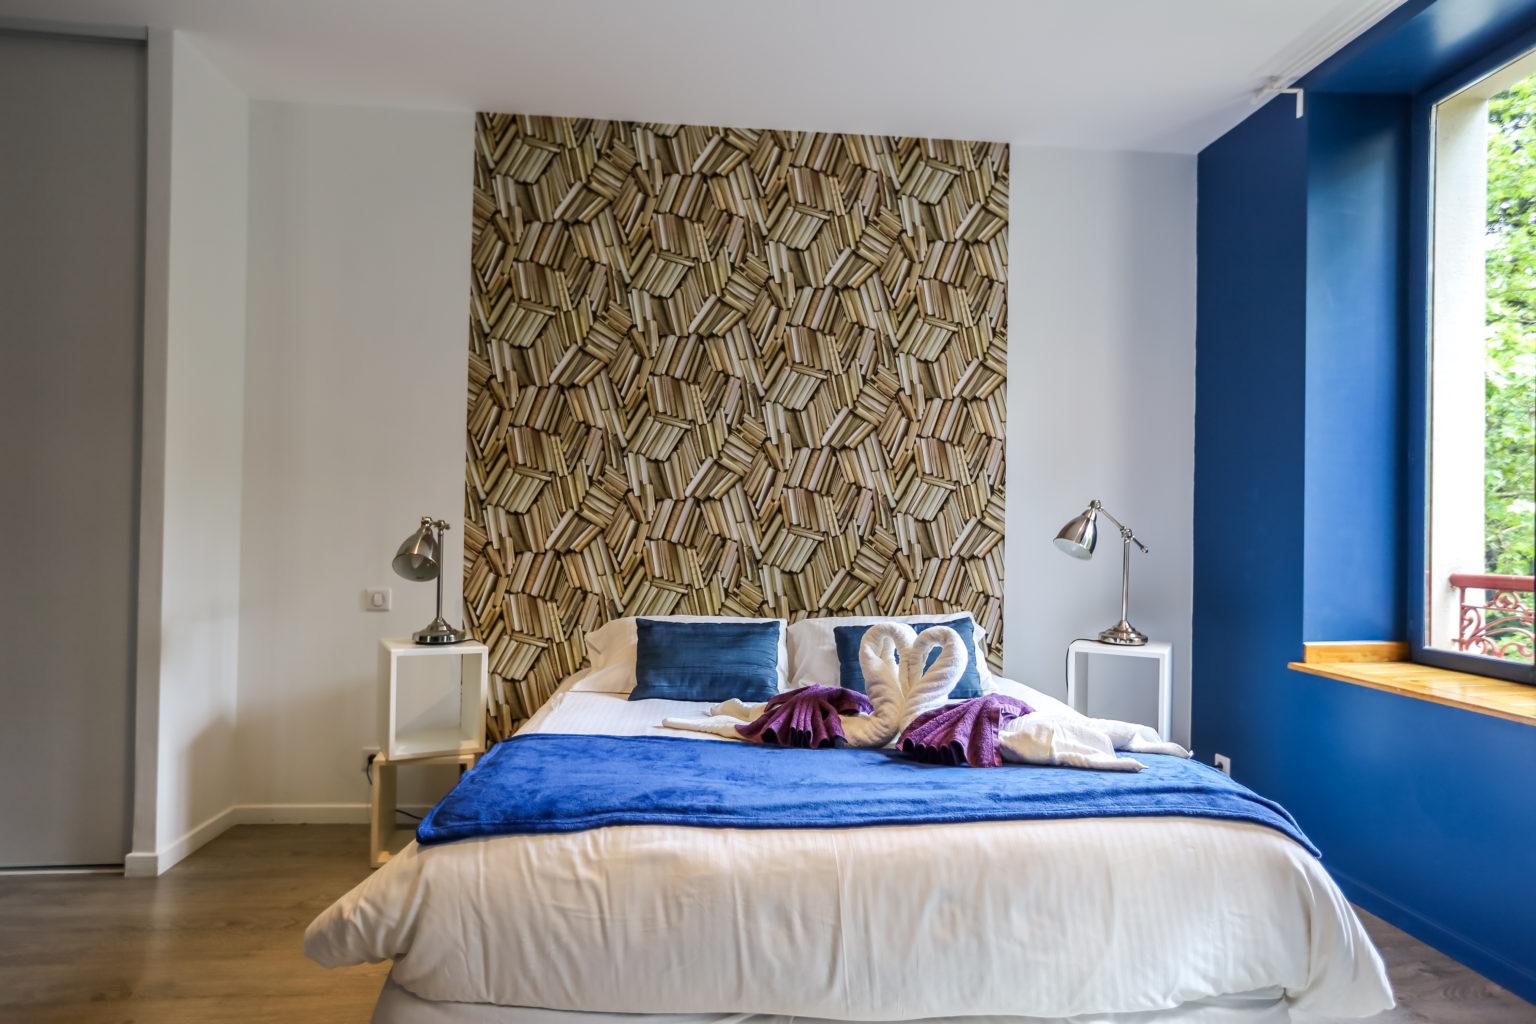 CHAMBRE LA FONTVINEUSE IMG_1606LA FONT VINEUSE HOTEL & SPA